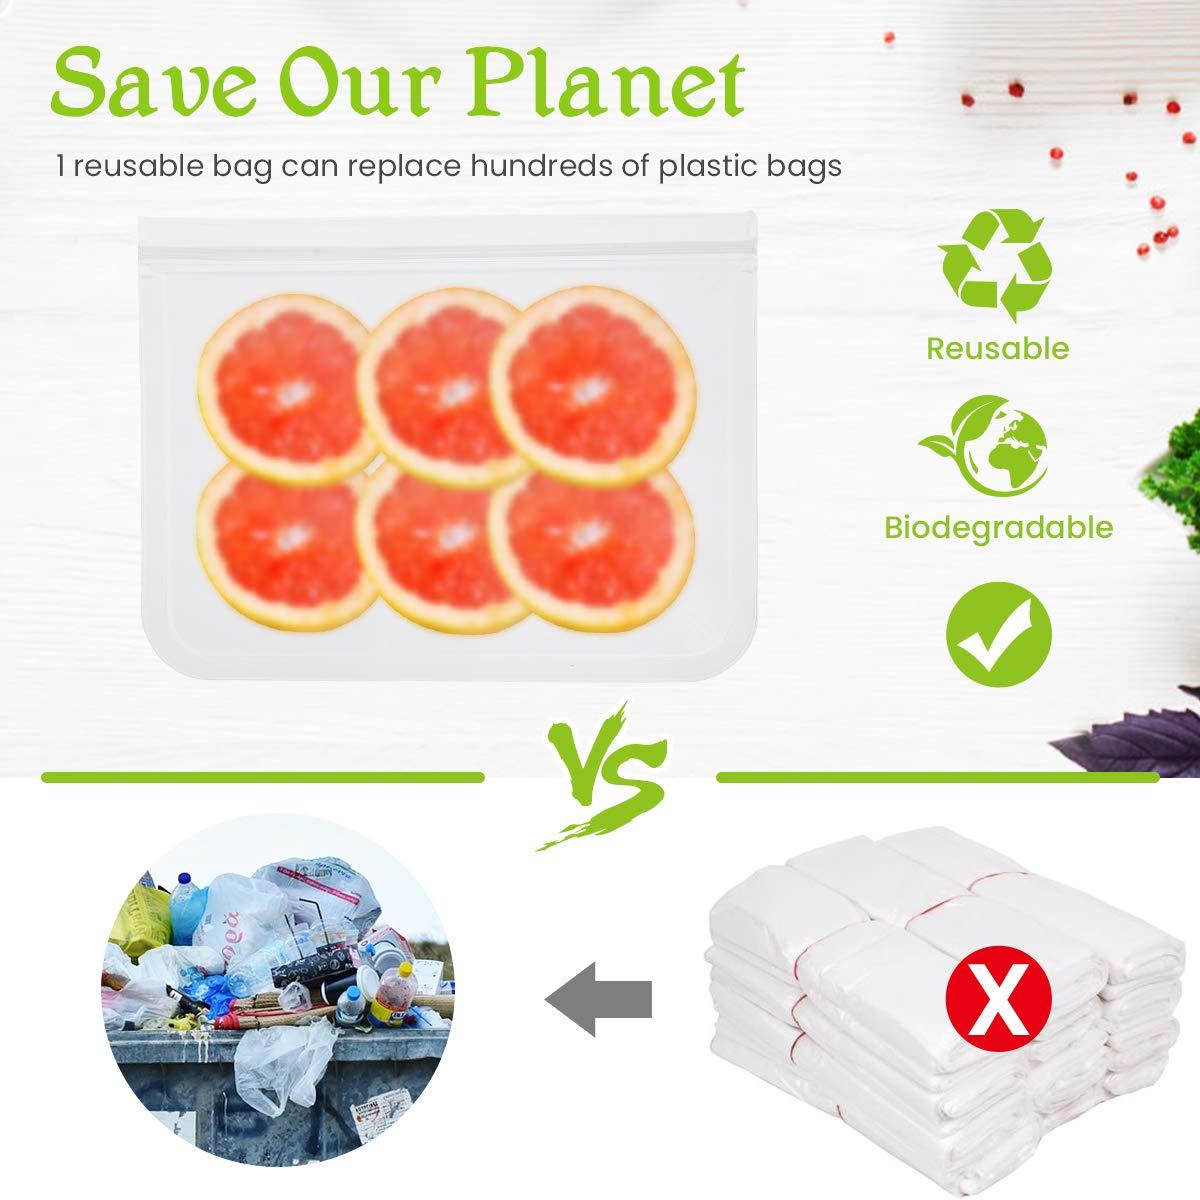 Godmorn Bolsas de Almacenamiento de Alimentos Reutilizables,Biodegradables,Bolsas de Congelaci/ón Reutilizables,10Paquetes Bolsas para Almacenar S/ándwiches,Verduras,Frutas.A Prueba de Fugas,Sin BPA